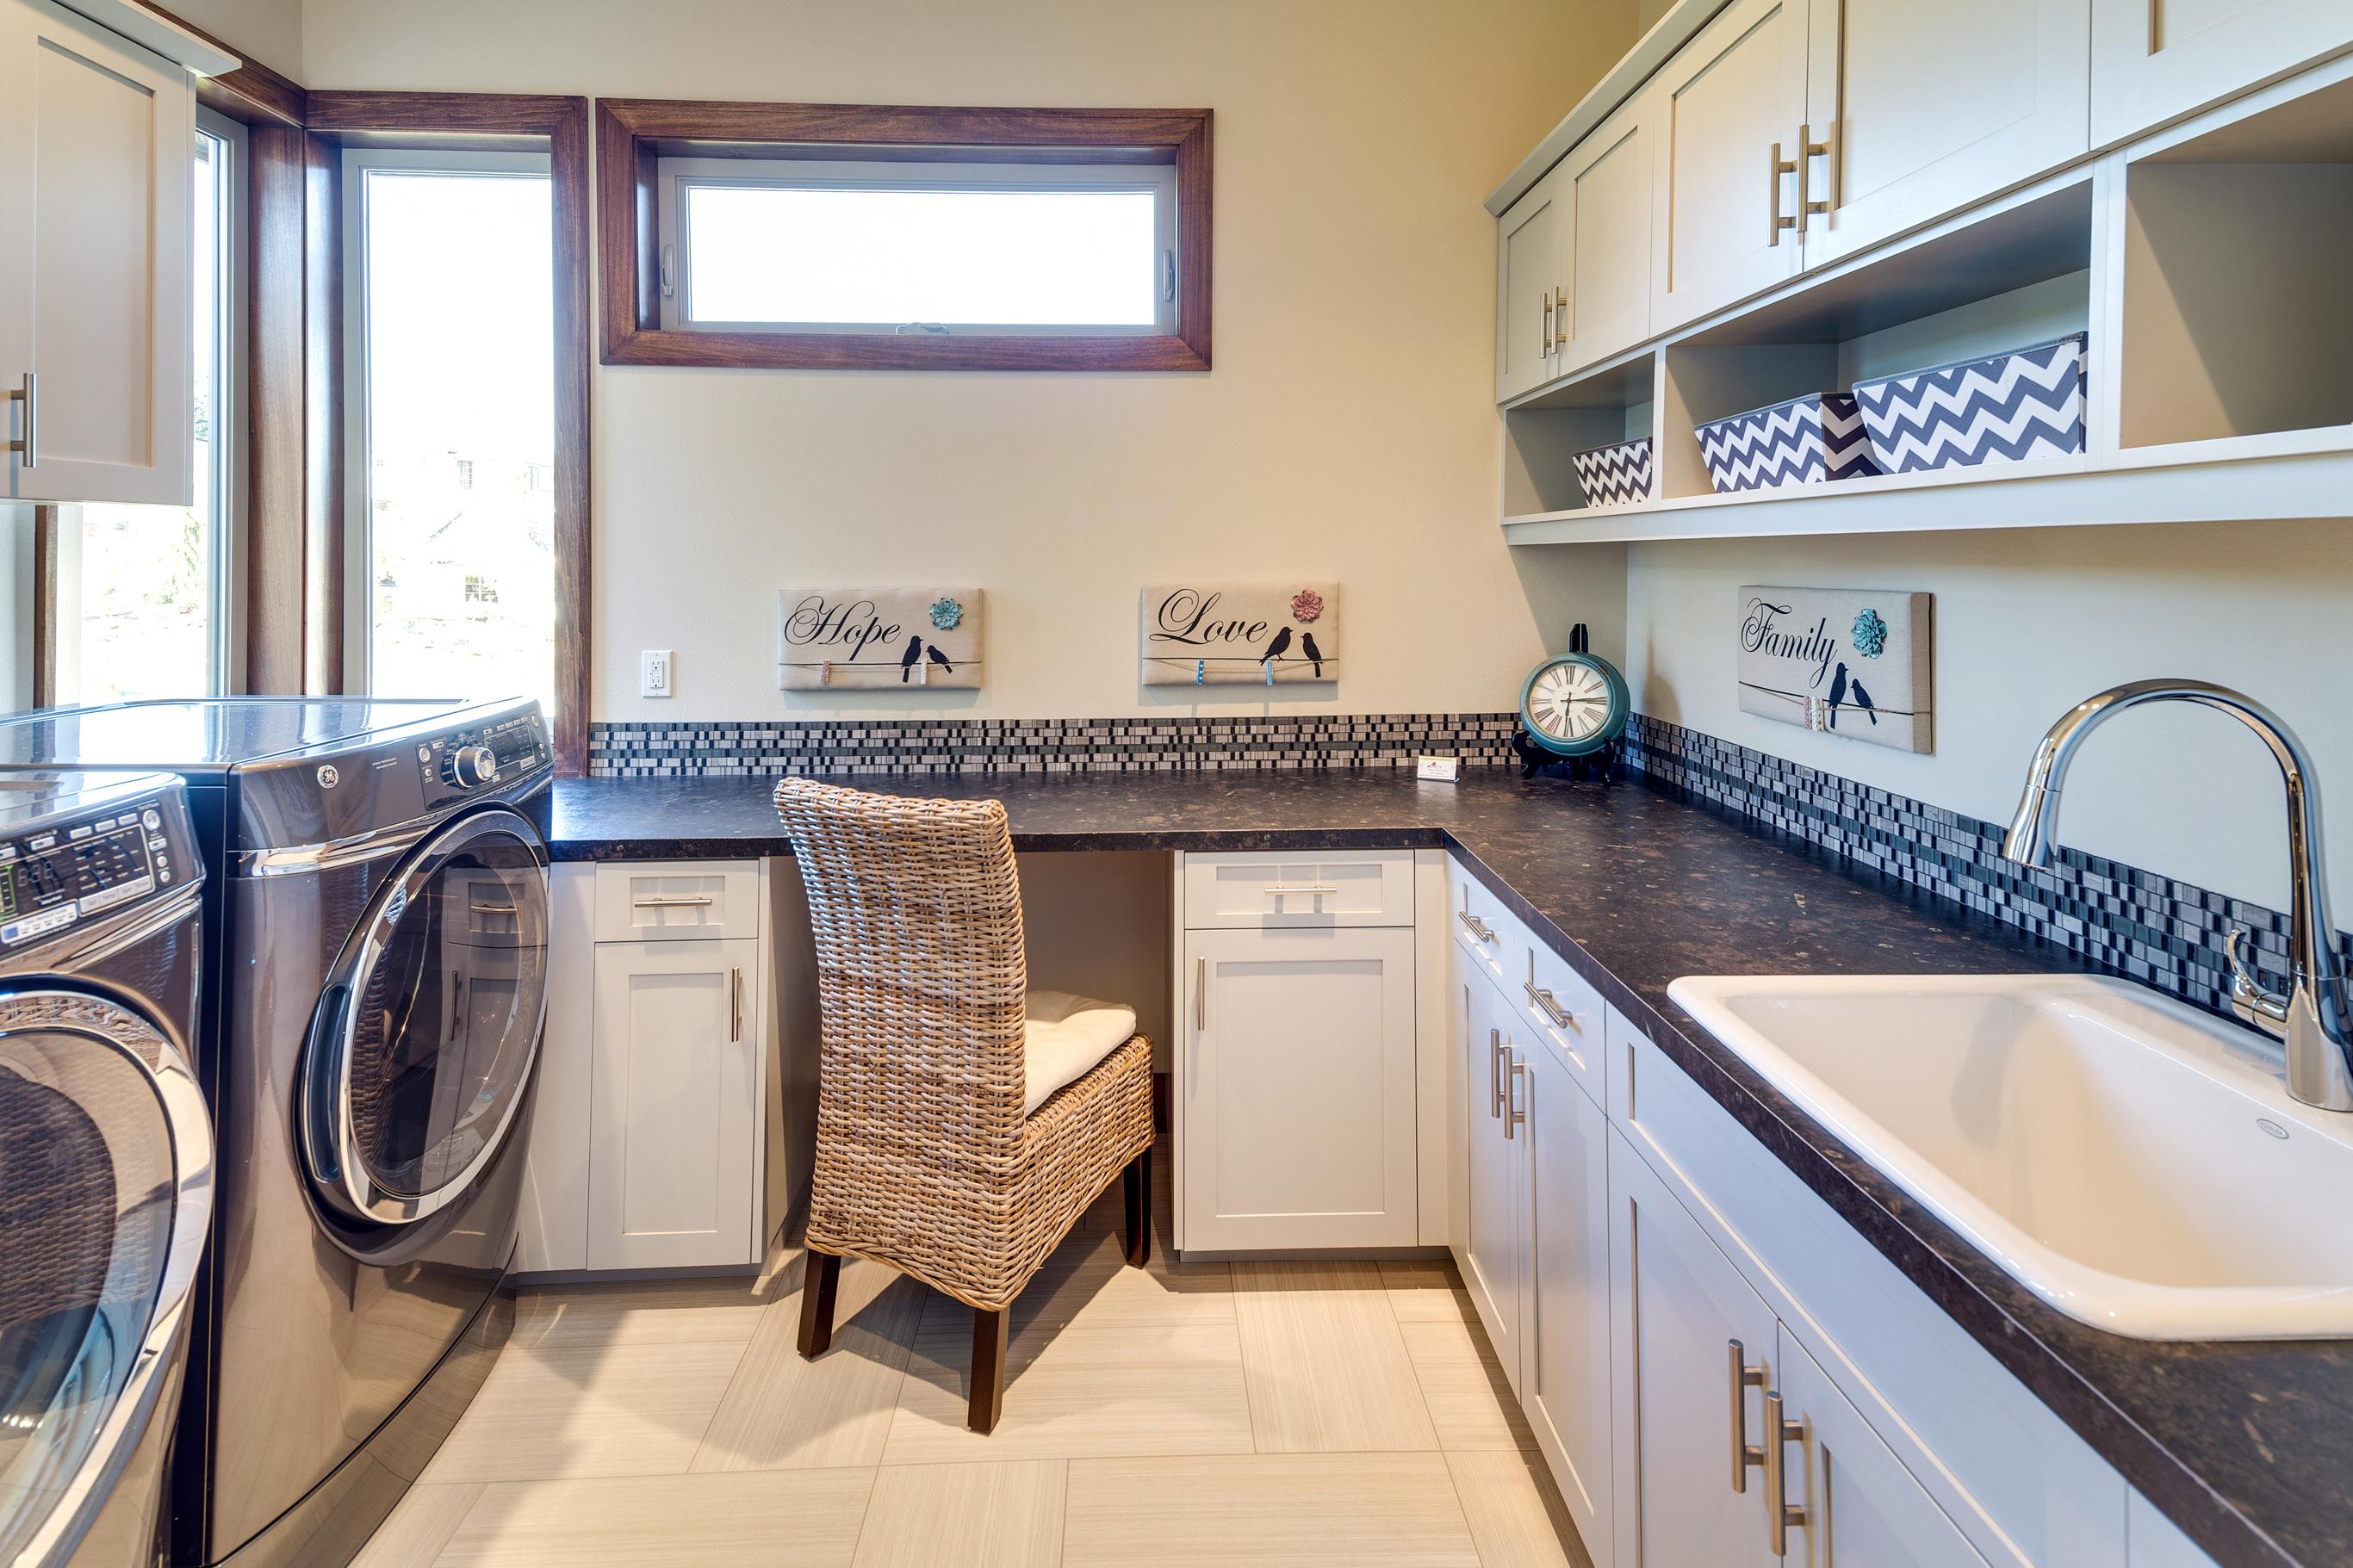 Grey Laundry Room Cabinets